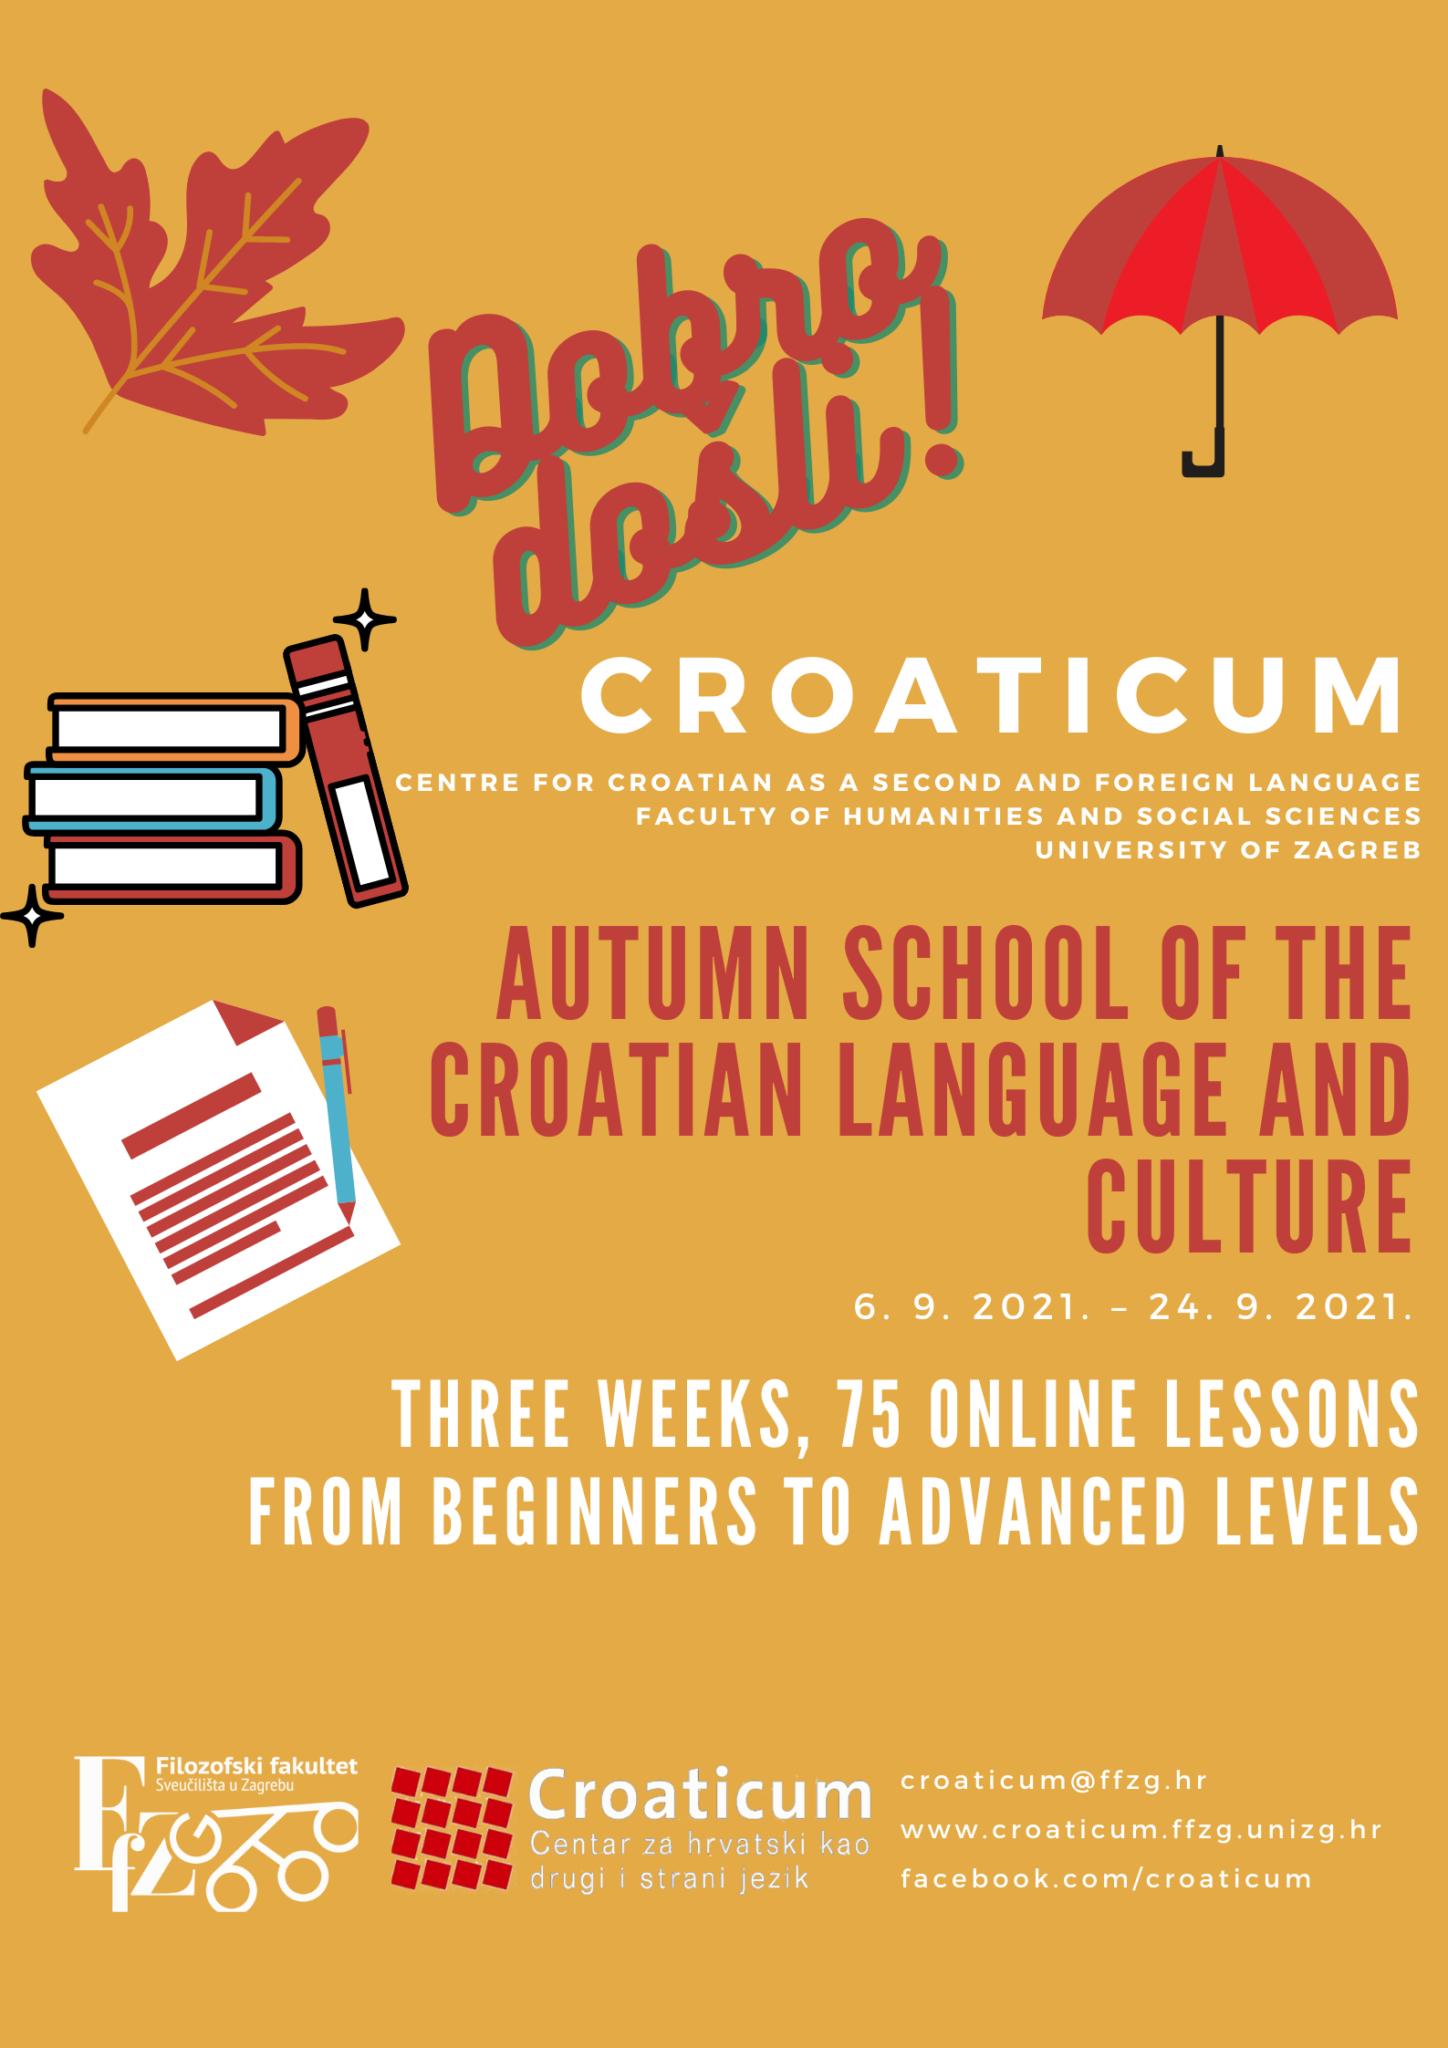 Croaticum autumn school of Croatian language and culture online